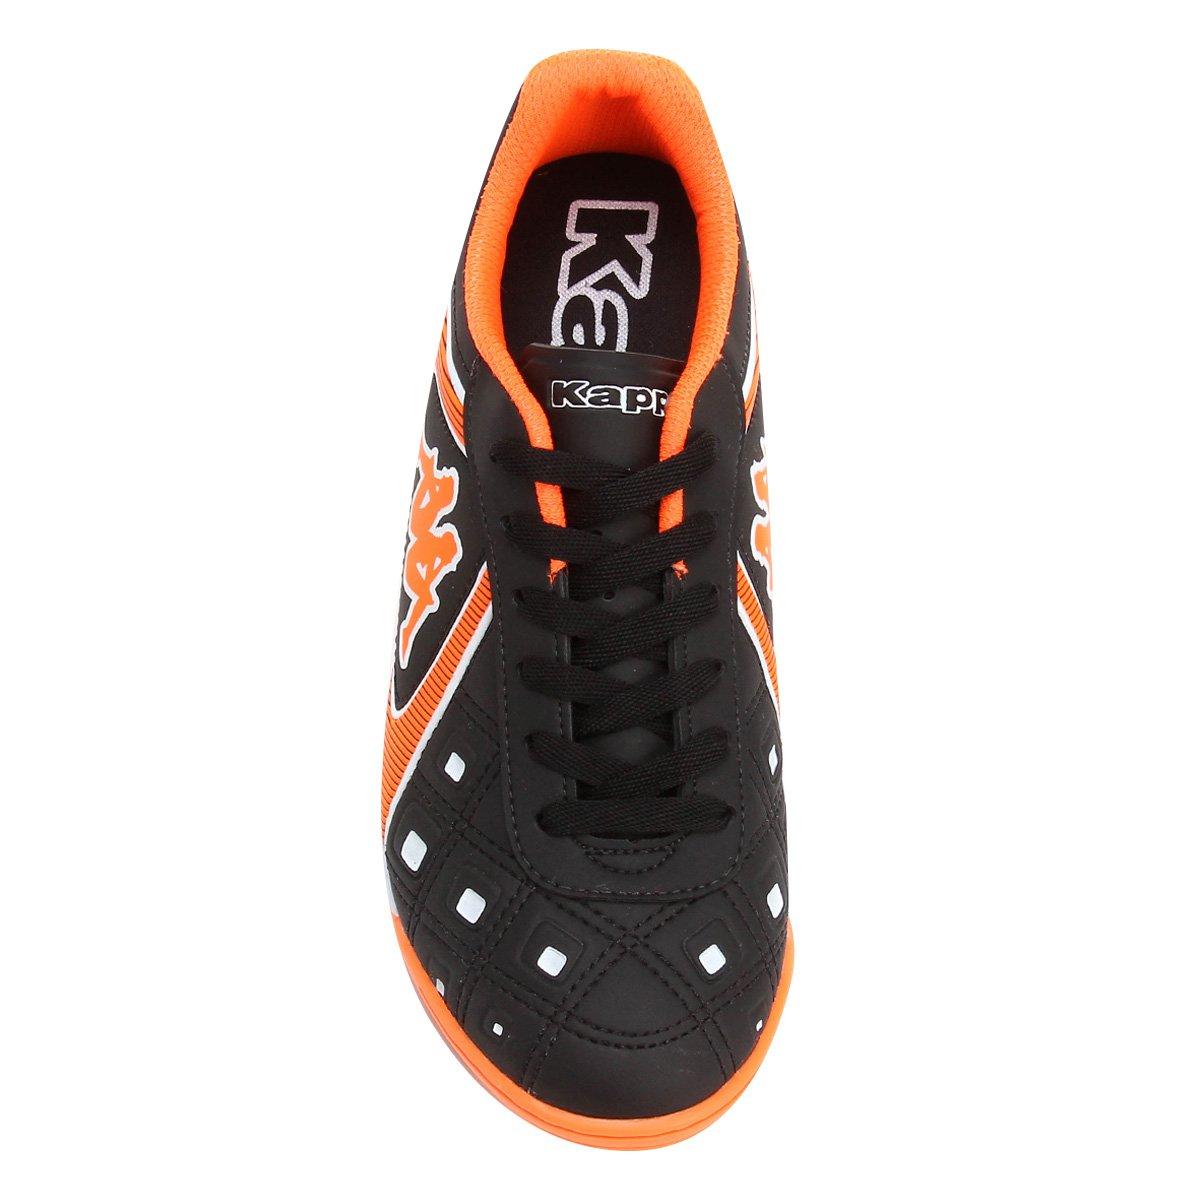 Chuteira Futsal Kappa Catanzaro - Preto e Laranja. Produto indisponível 09c9364865f00